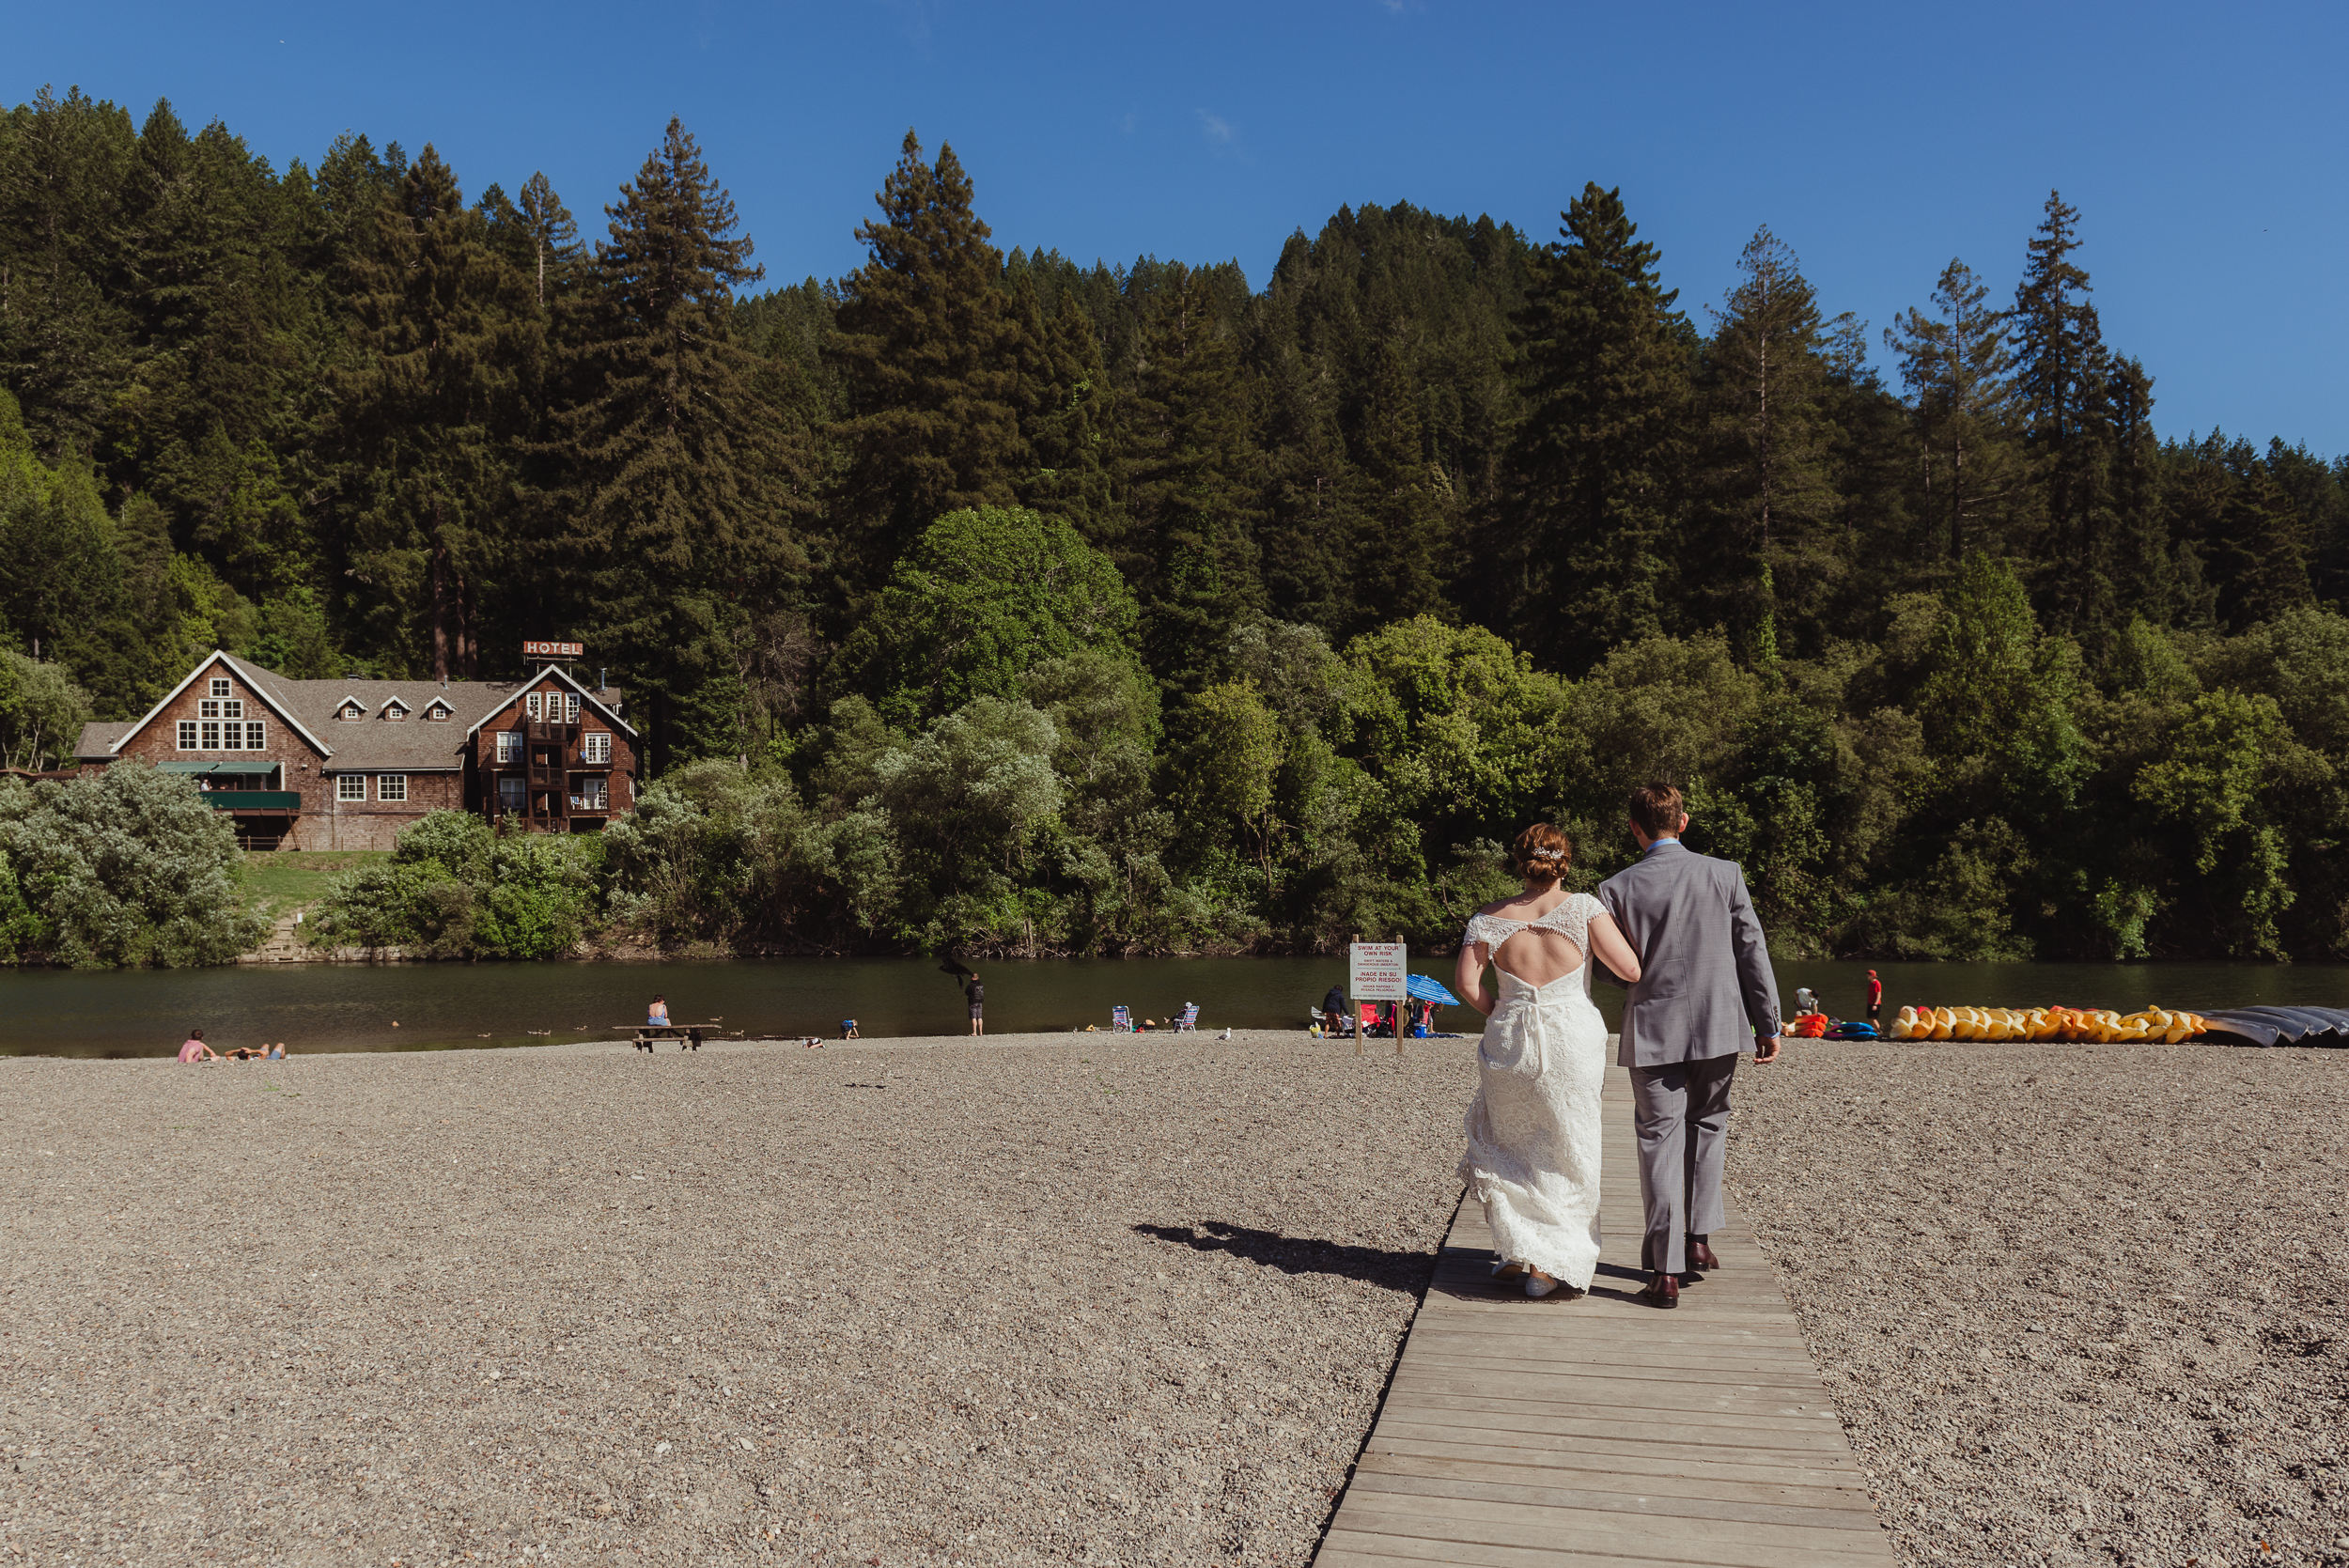 048-highland-dell-lodge-russian-river-wedding-vivianchen-346.jpg